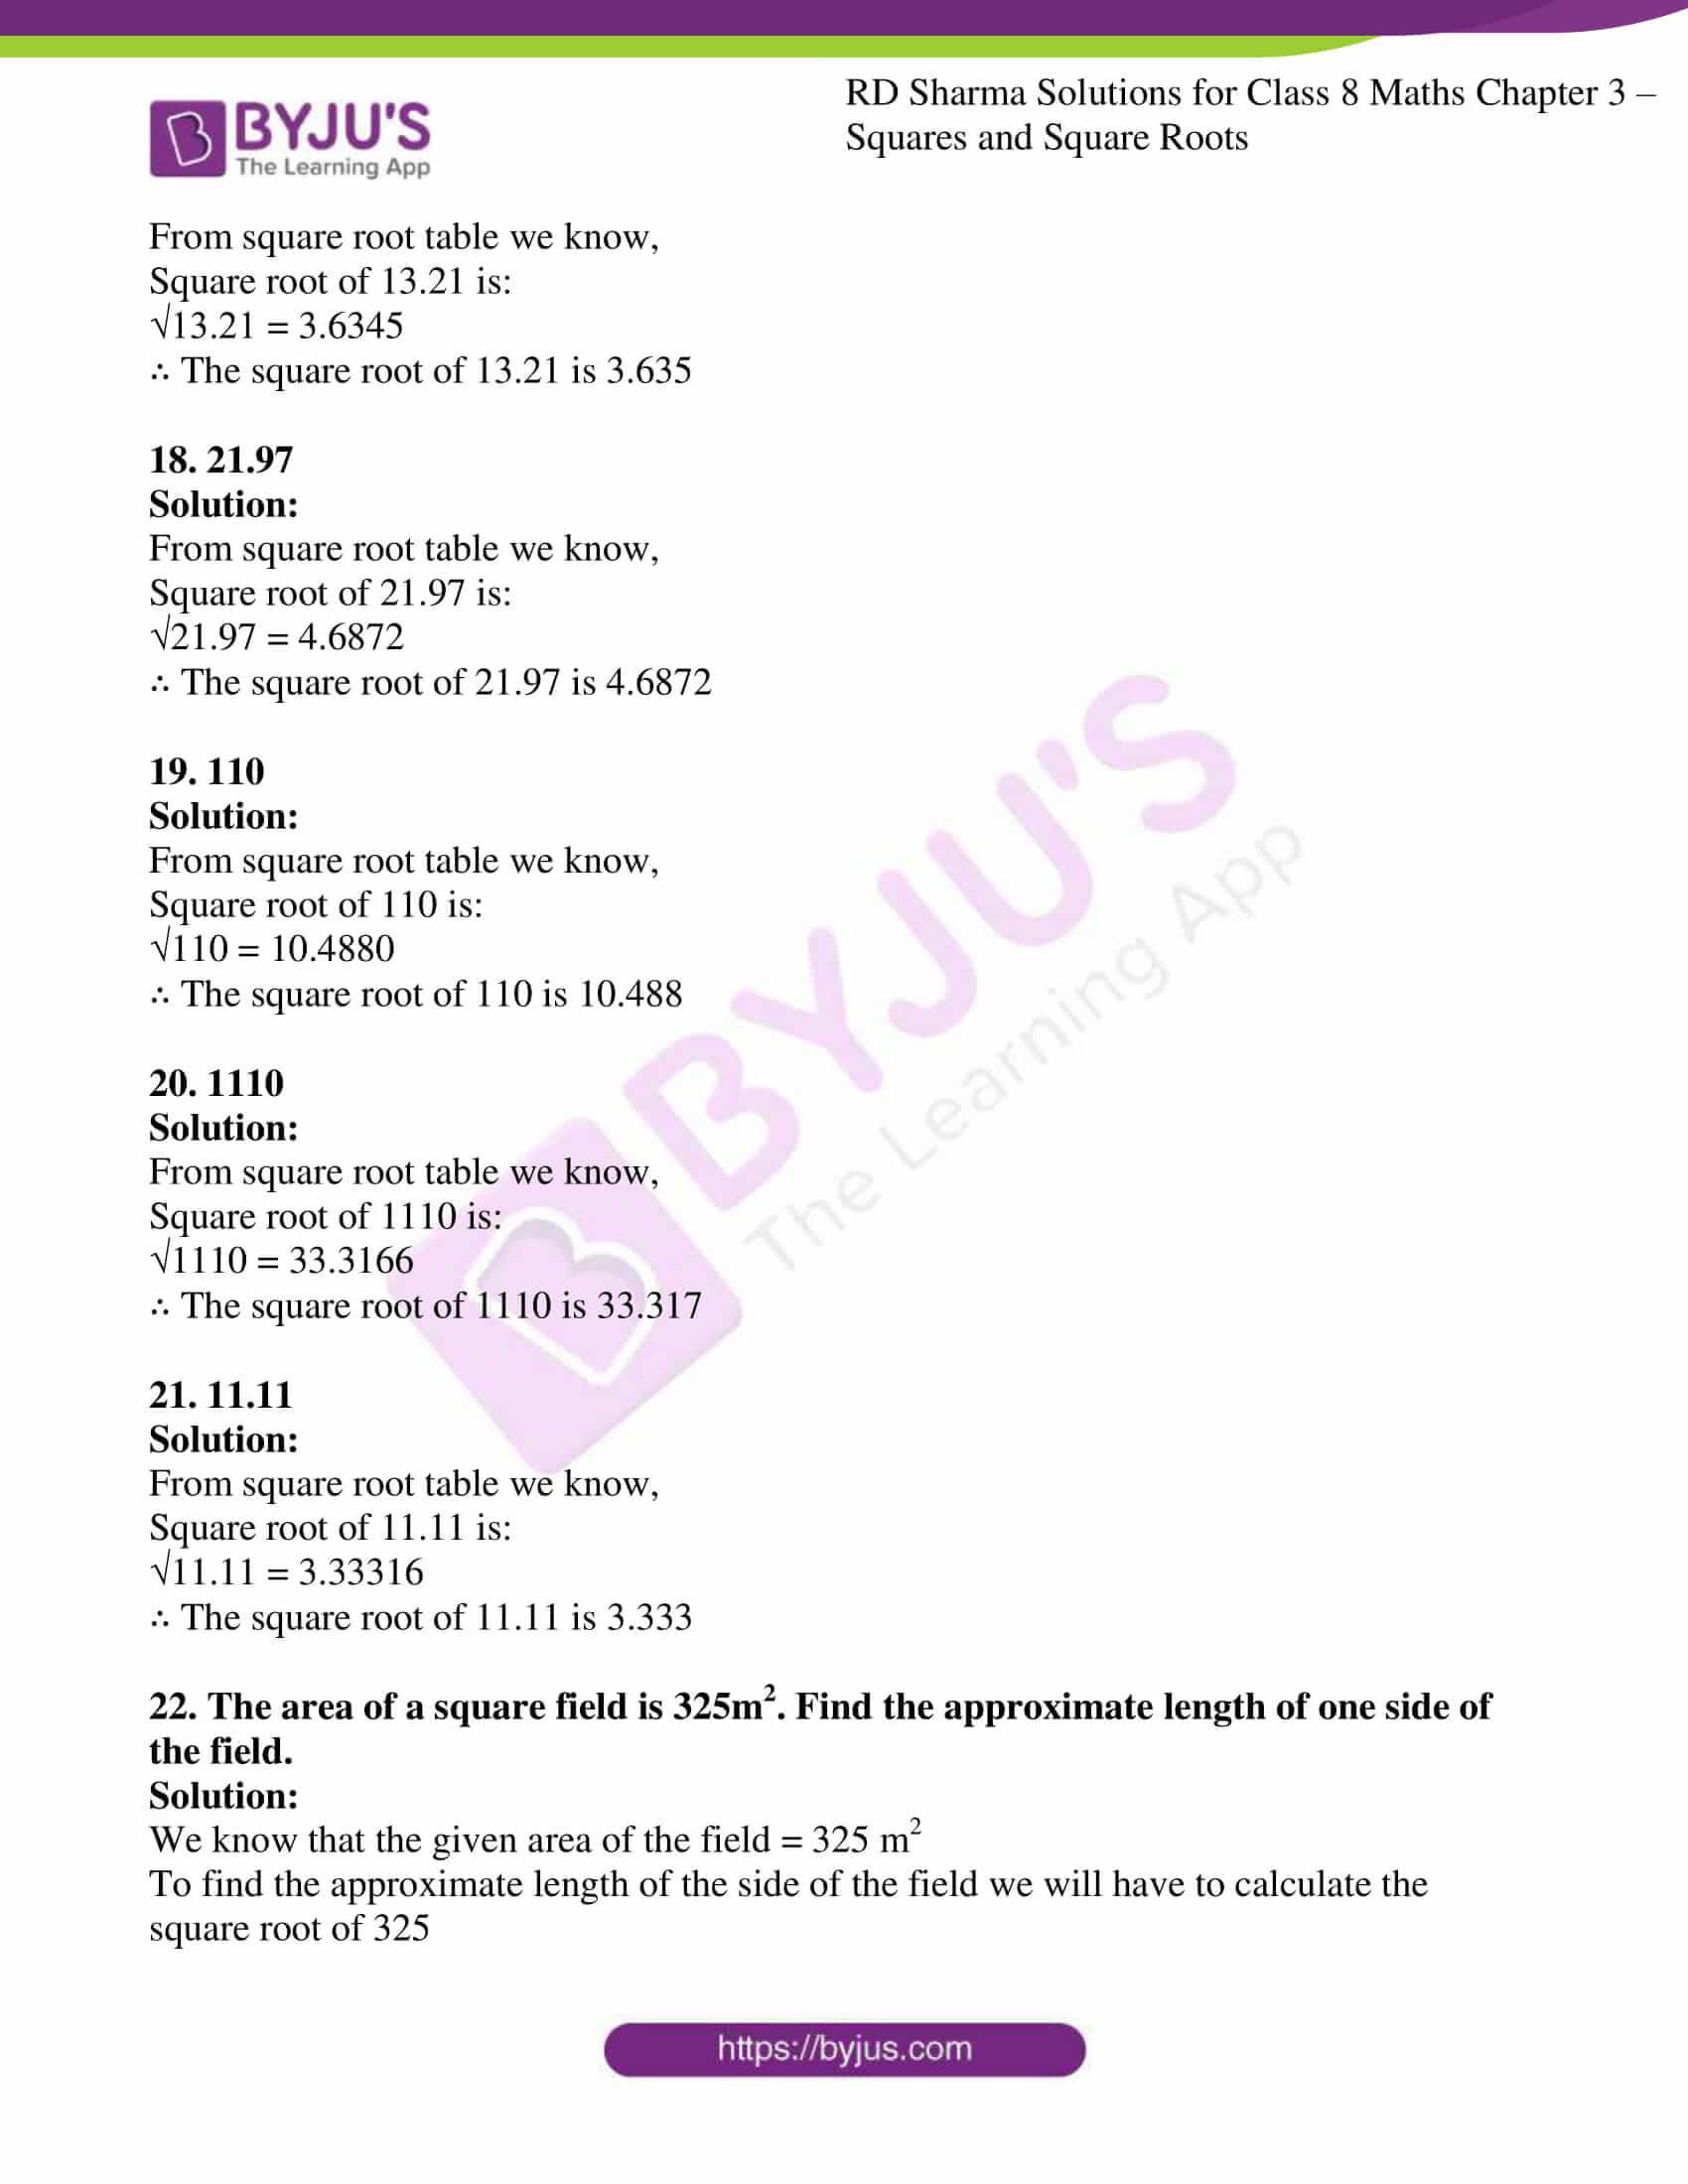 rd sharma class 8 maths chapter 3 exercise 9 4